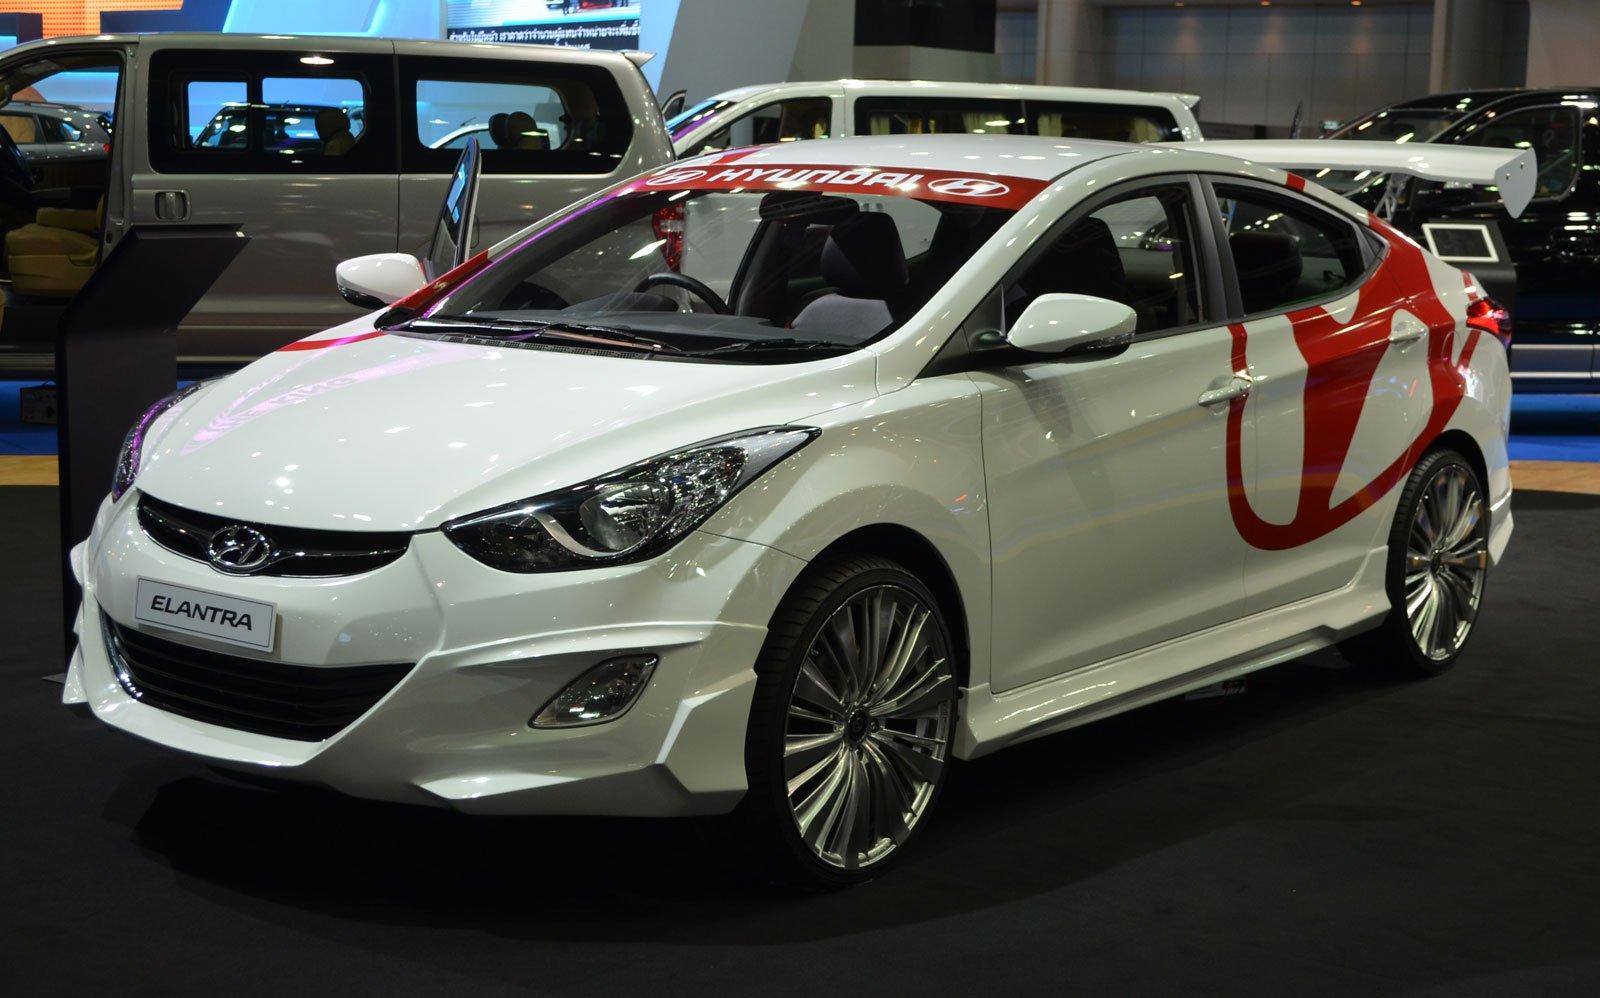 Thai Motor Expo Hyundai Elantra Gives You Wings